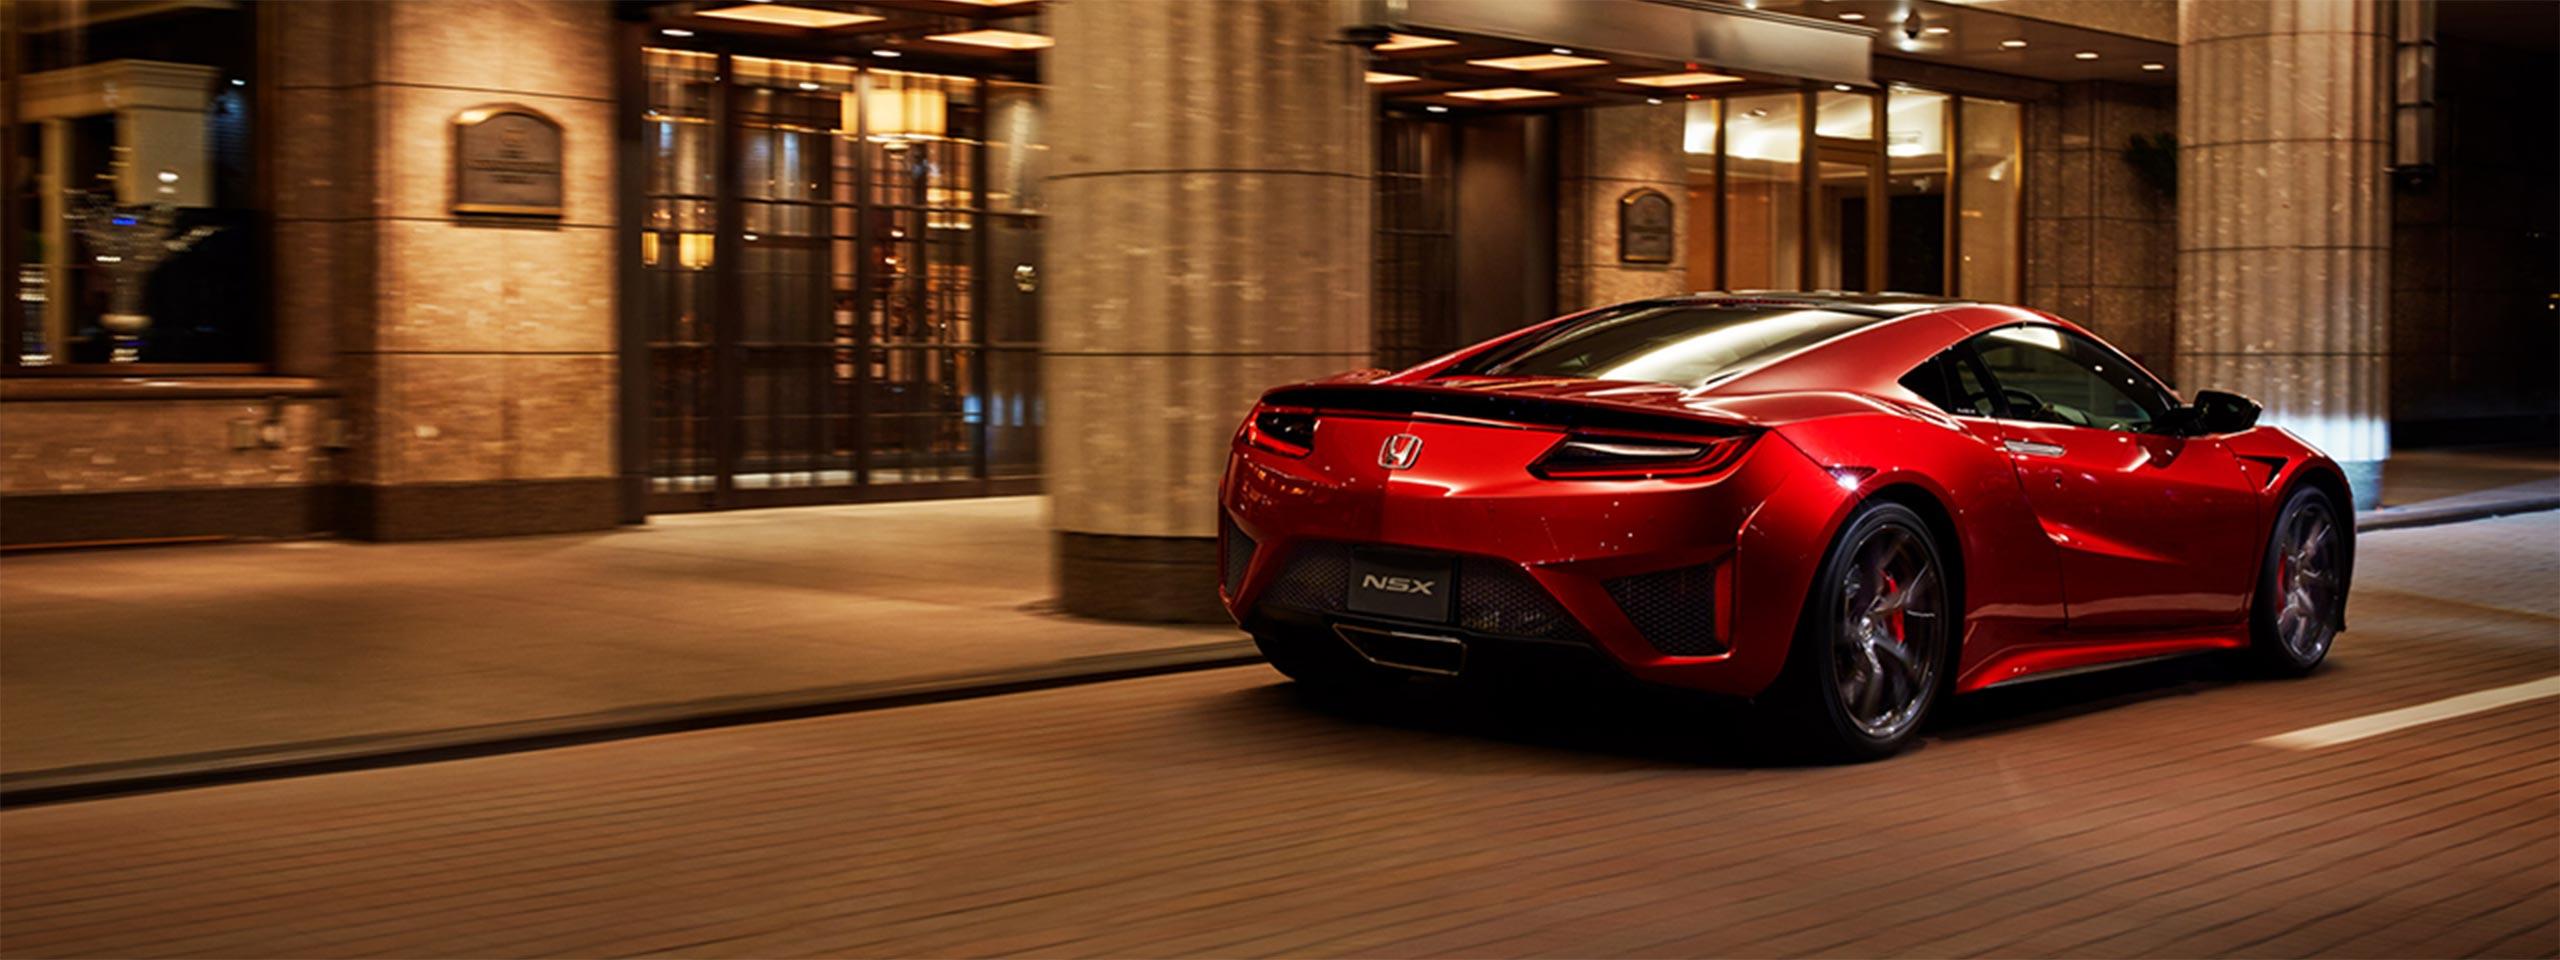 Honda Australia Discontinues Nsx Hybrid Supercar After Only 9 Sales Autoevolution